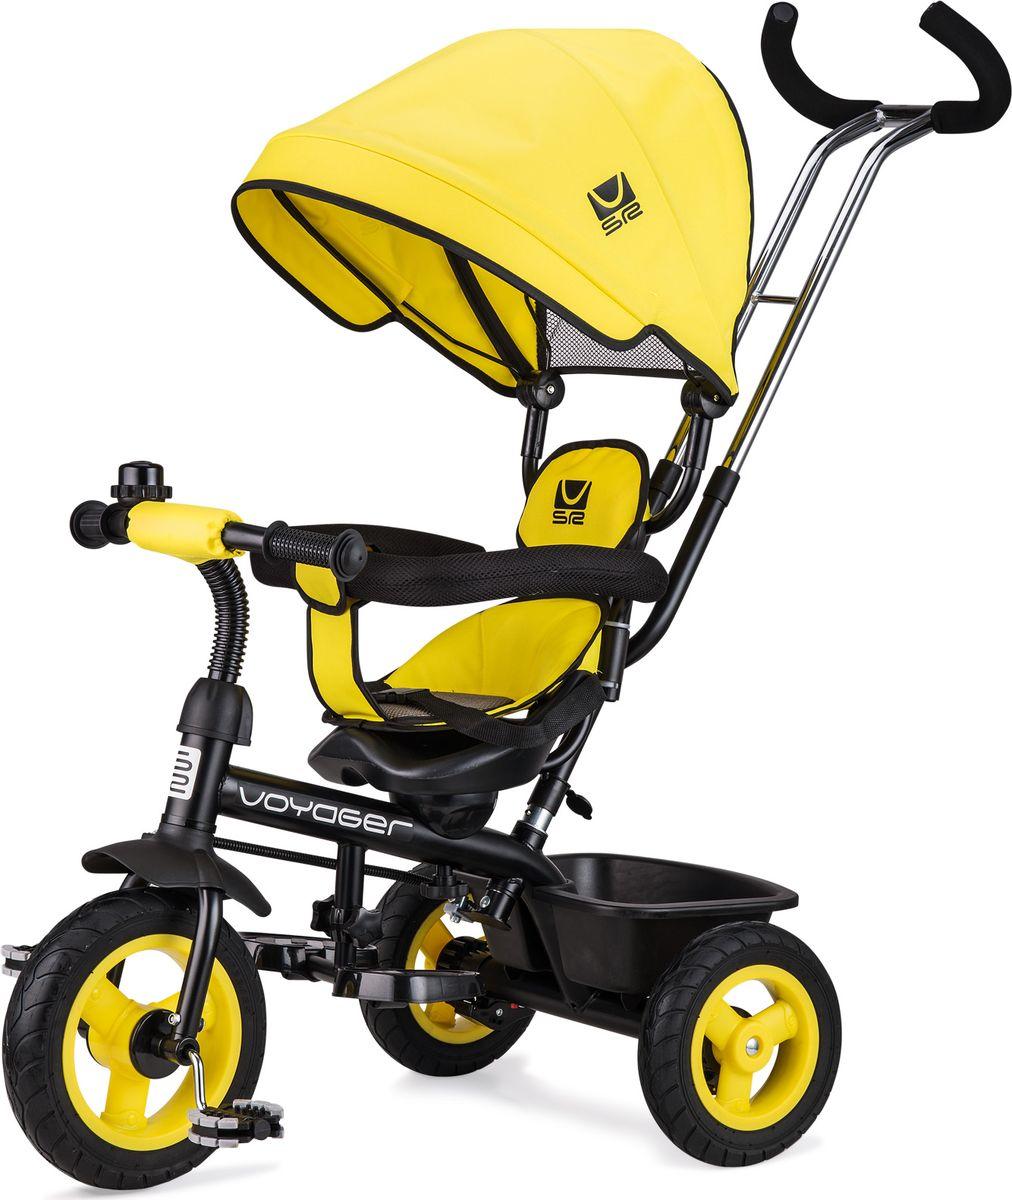 Small Rider Велосипед трехколесный Voyager цвет желтый